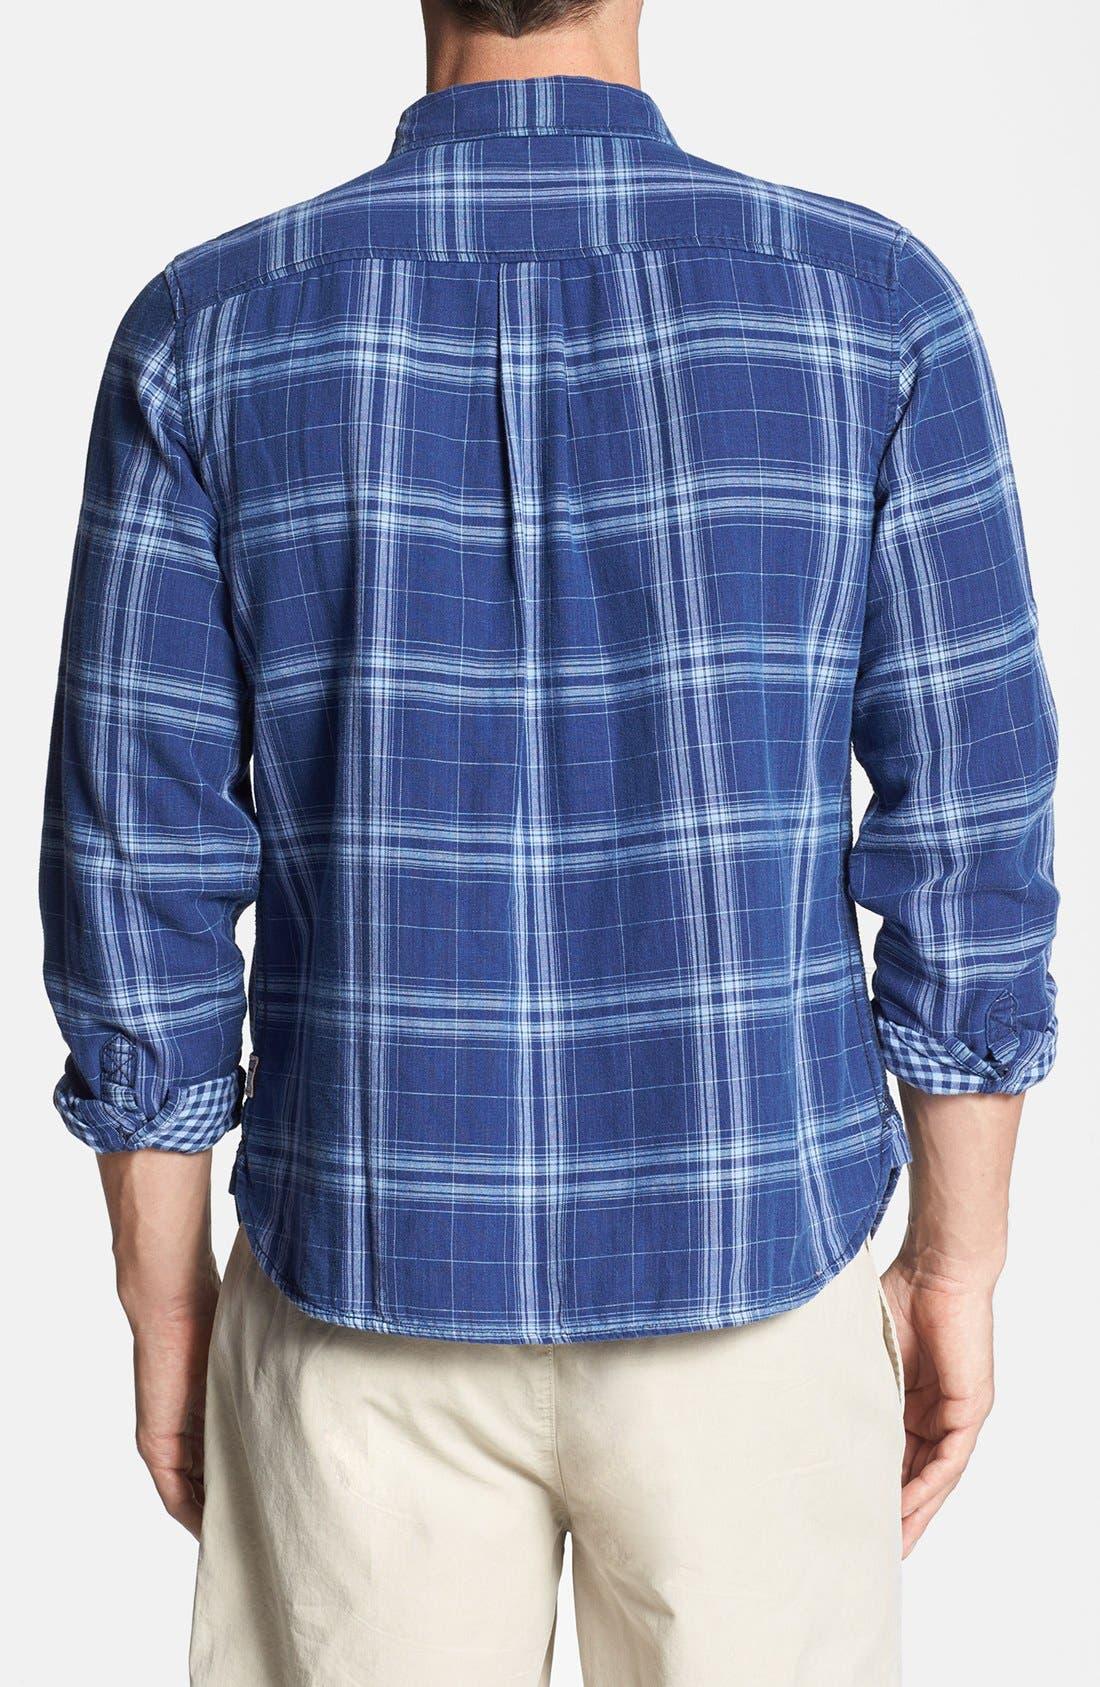 Alternate Image 2  - Surfside Supply Double Face Plaid Cotton Shirt